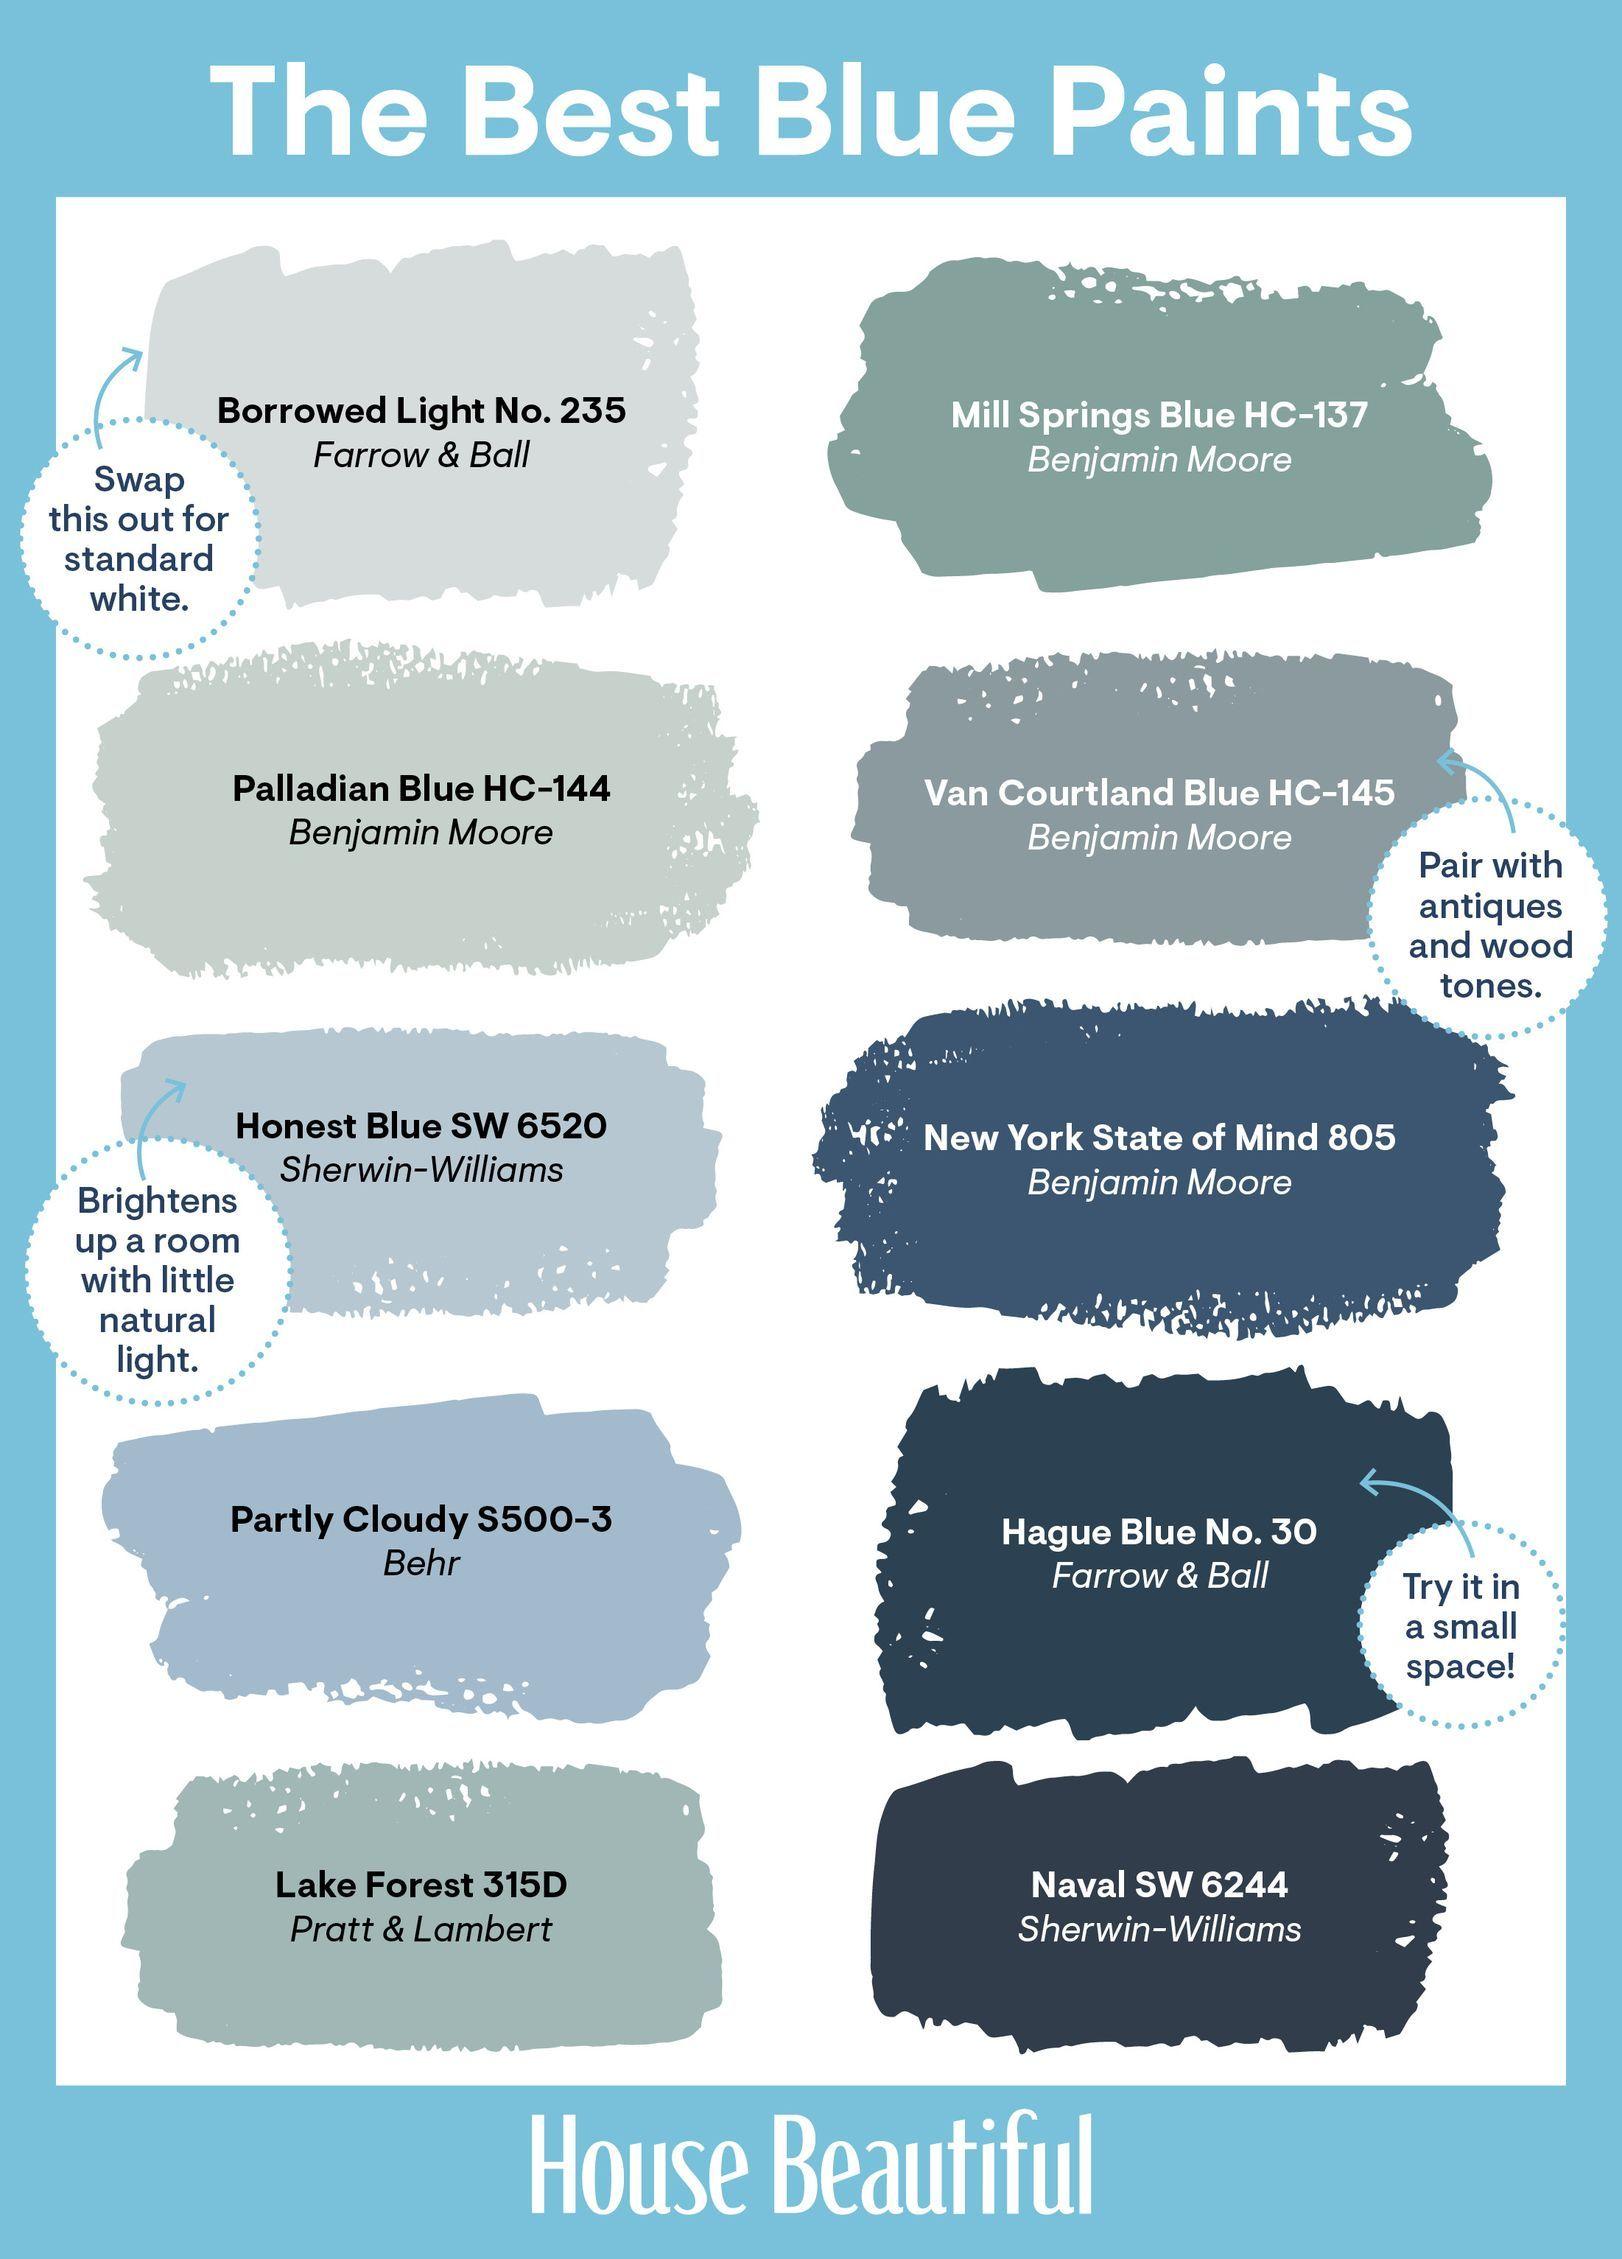 Psa These Are The Best Blue Paint Colors Ever Best Blue Paint